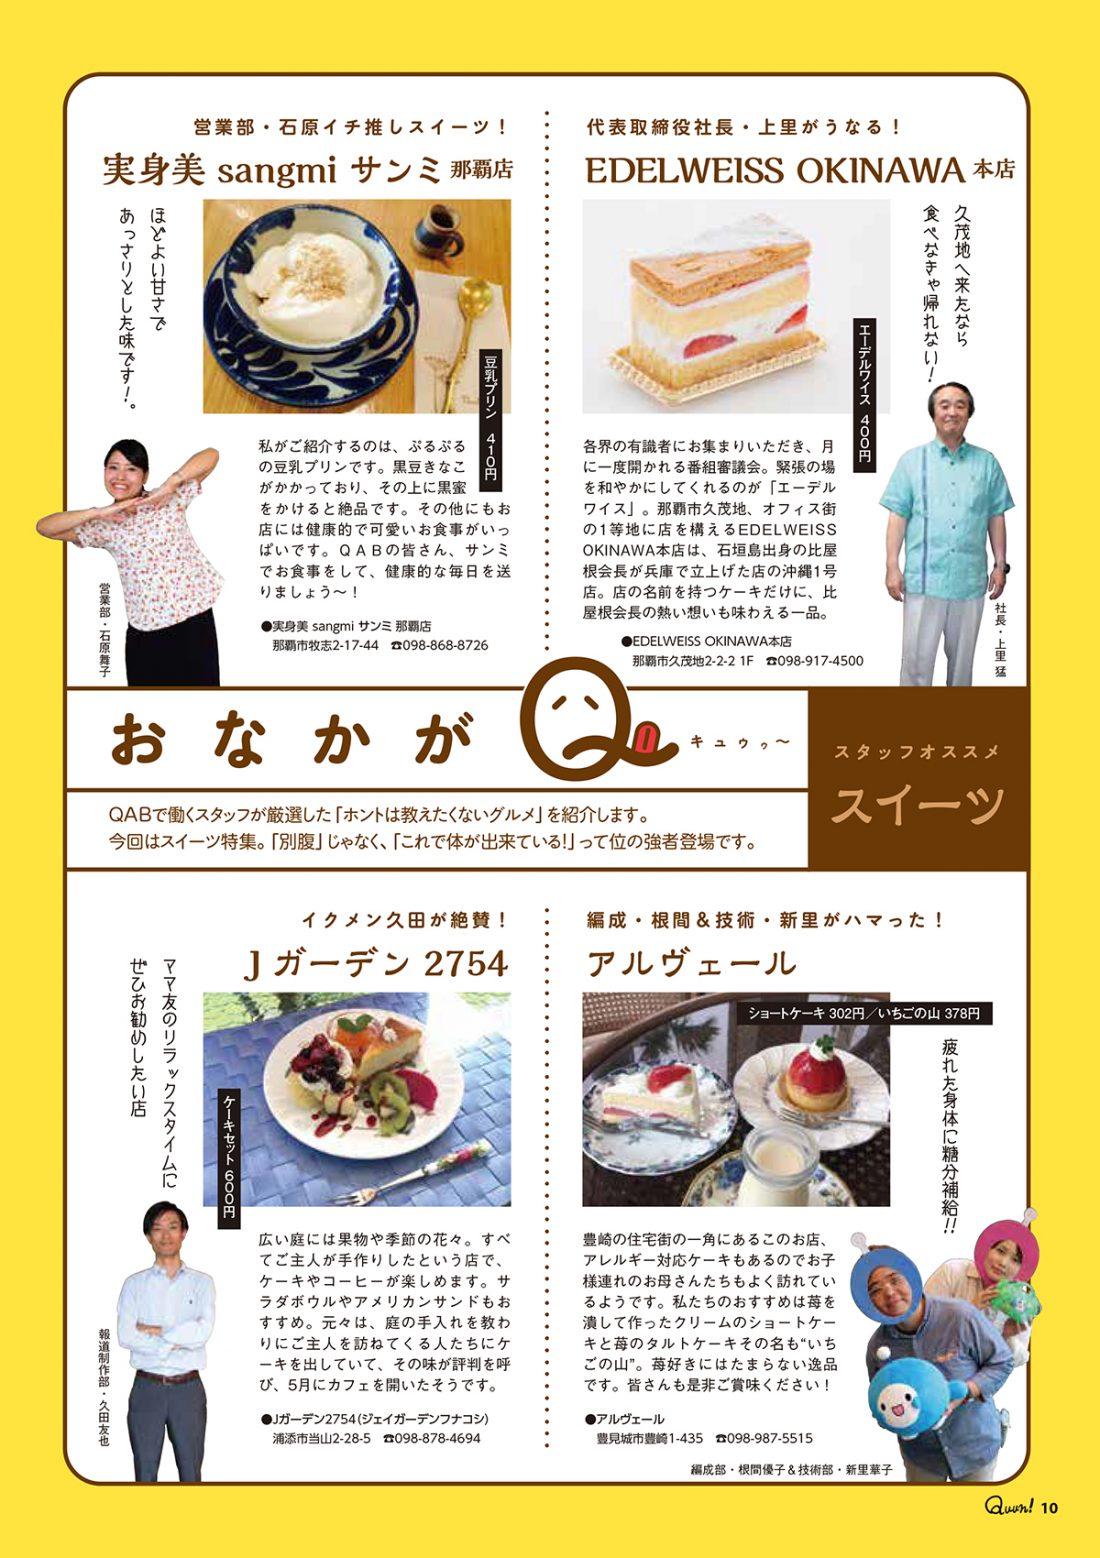 https://www.qab.co.jp/qgoro/wp-content/uploads/quun_0412-1100x1558.jpg